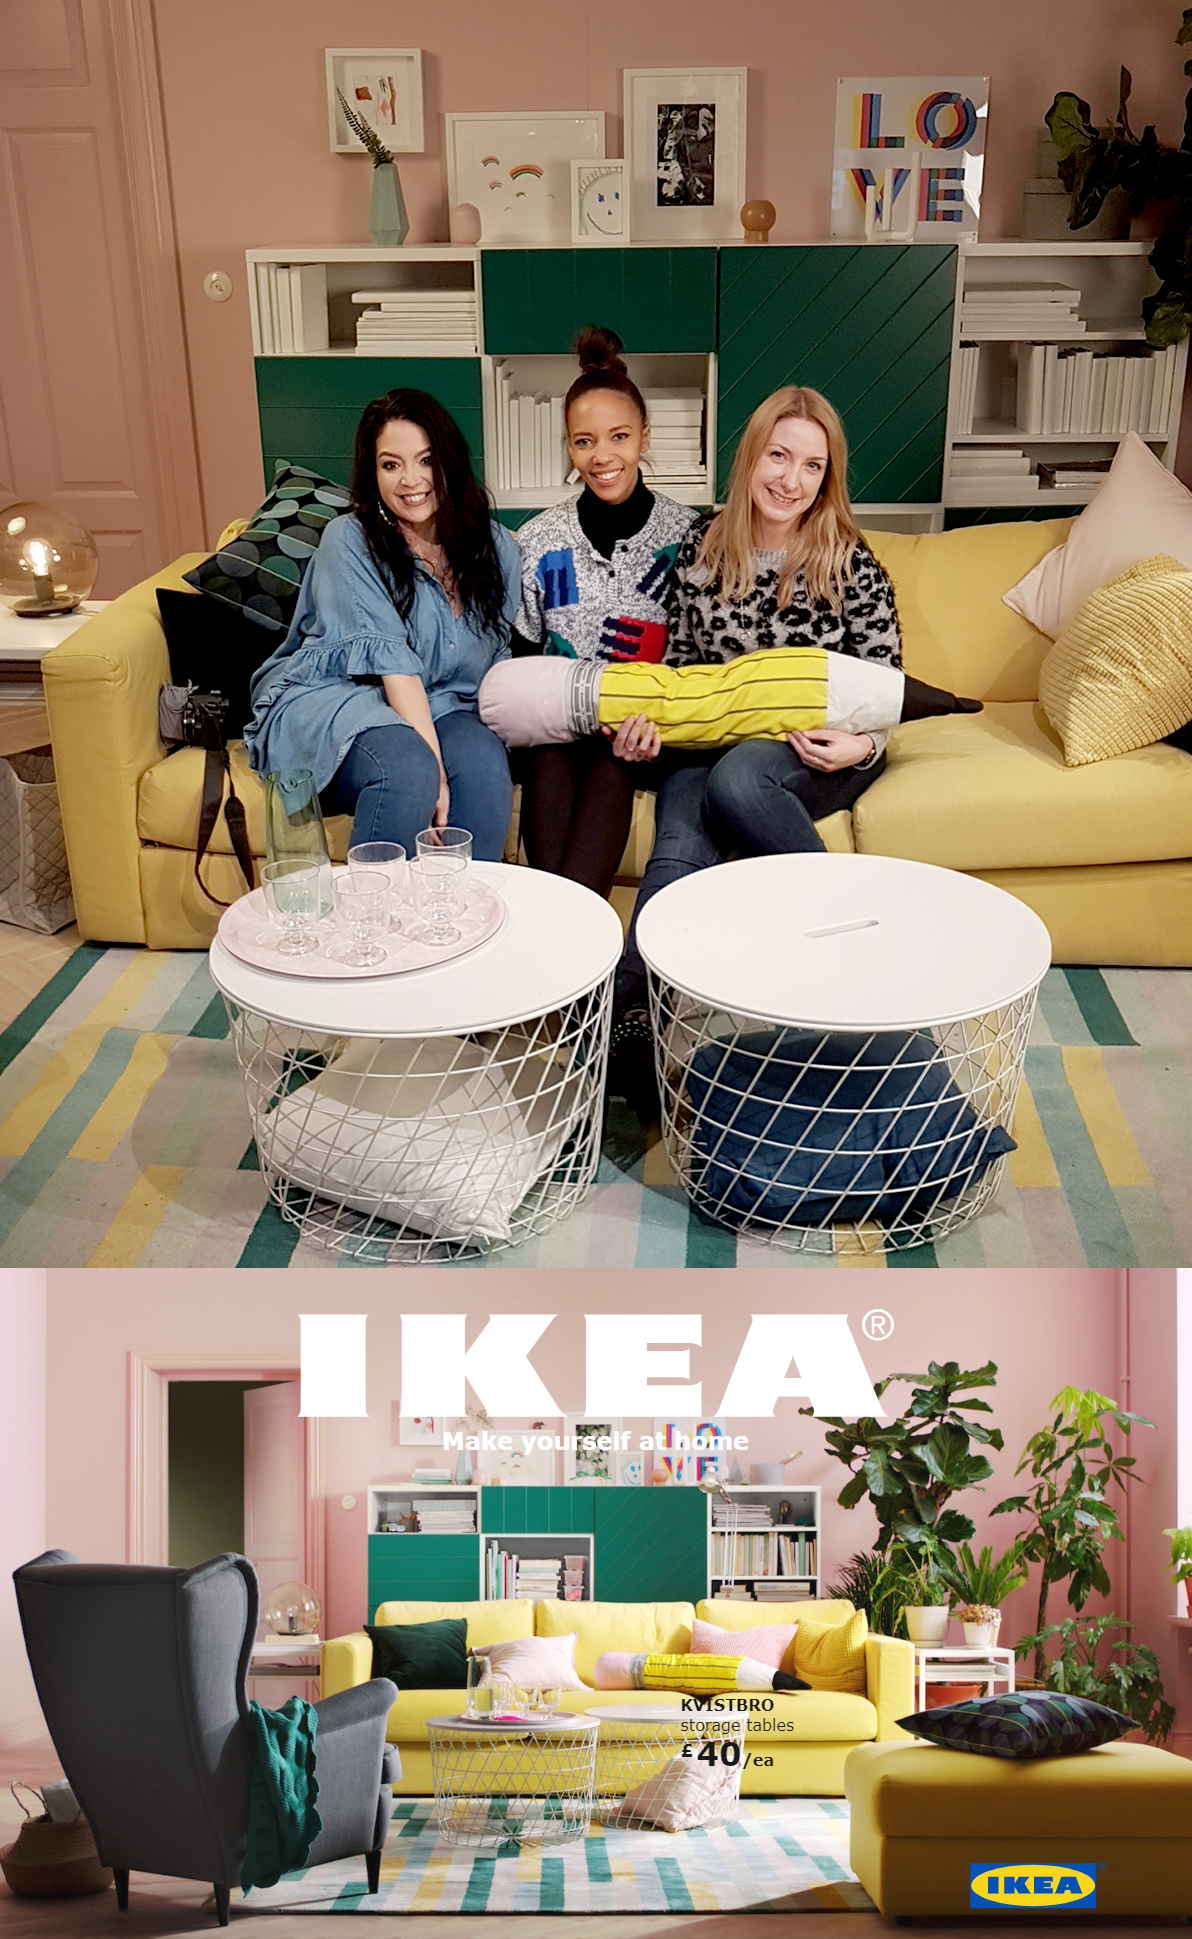 Recreating the IKEA catalogue shot